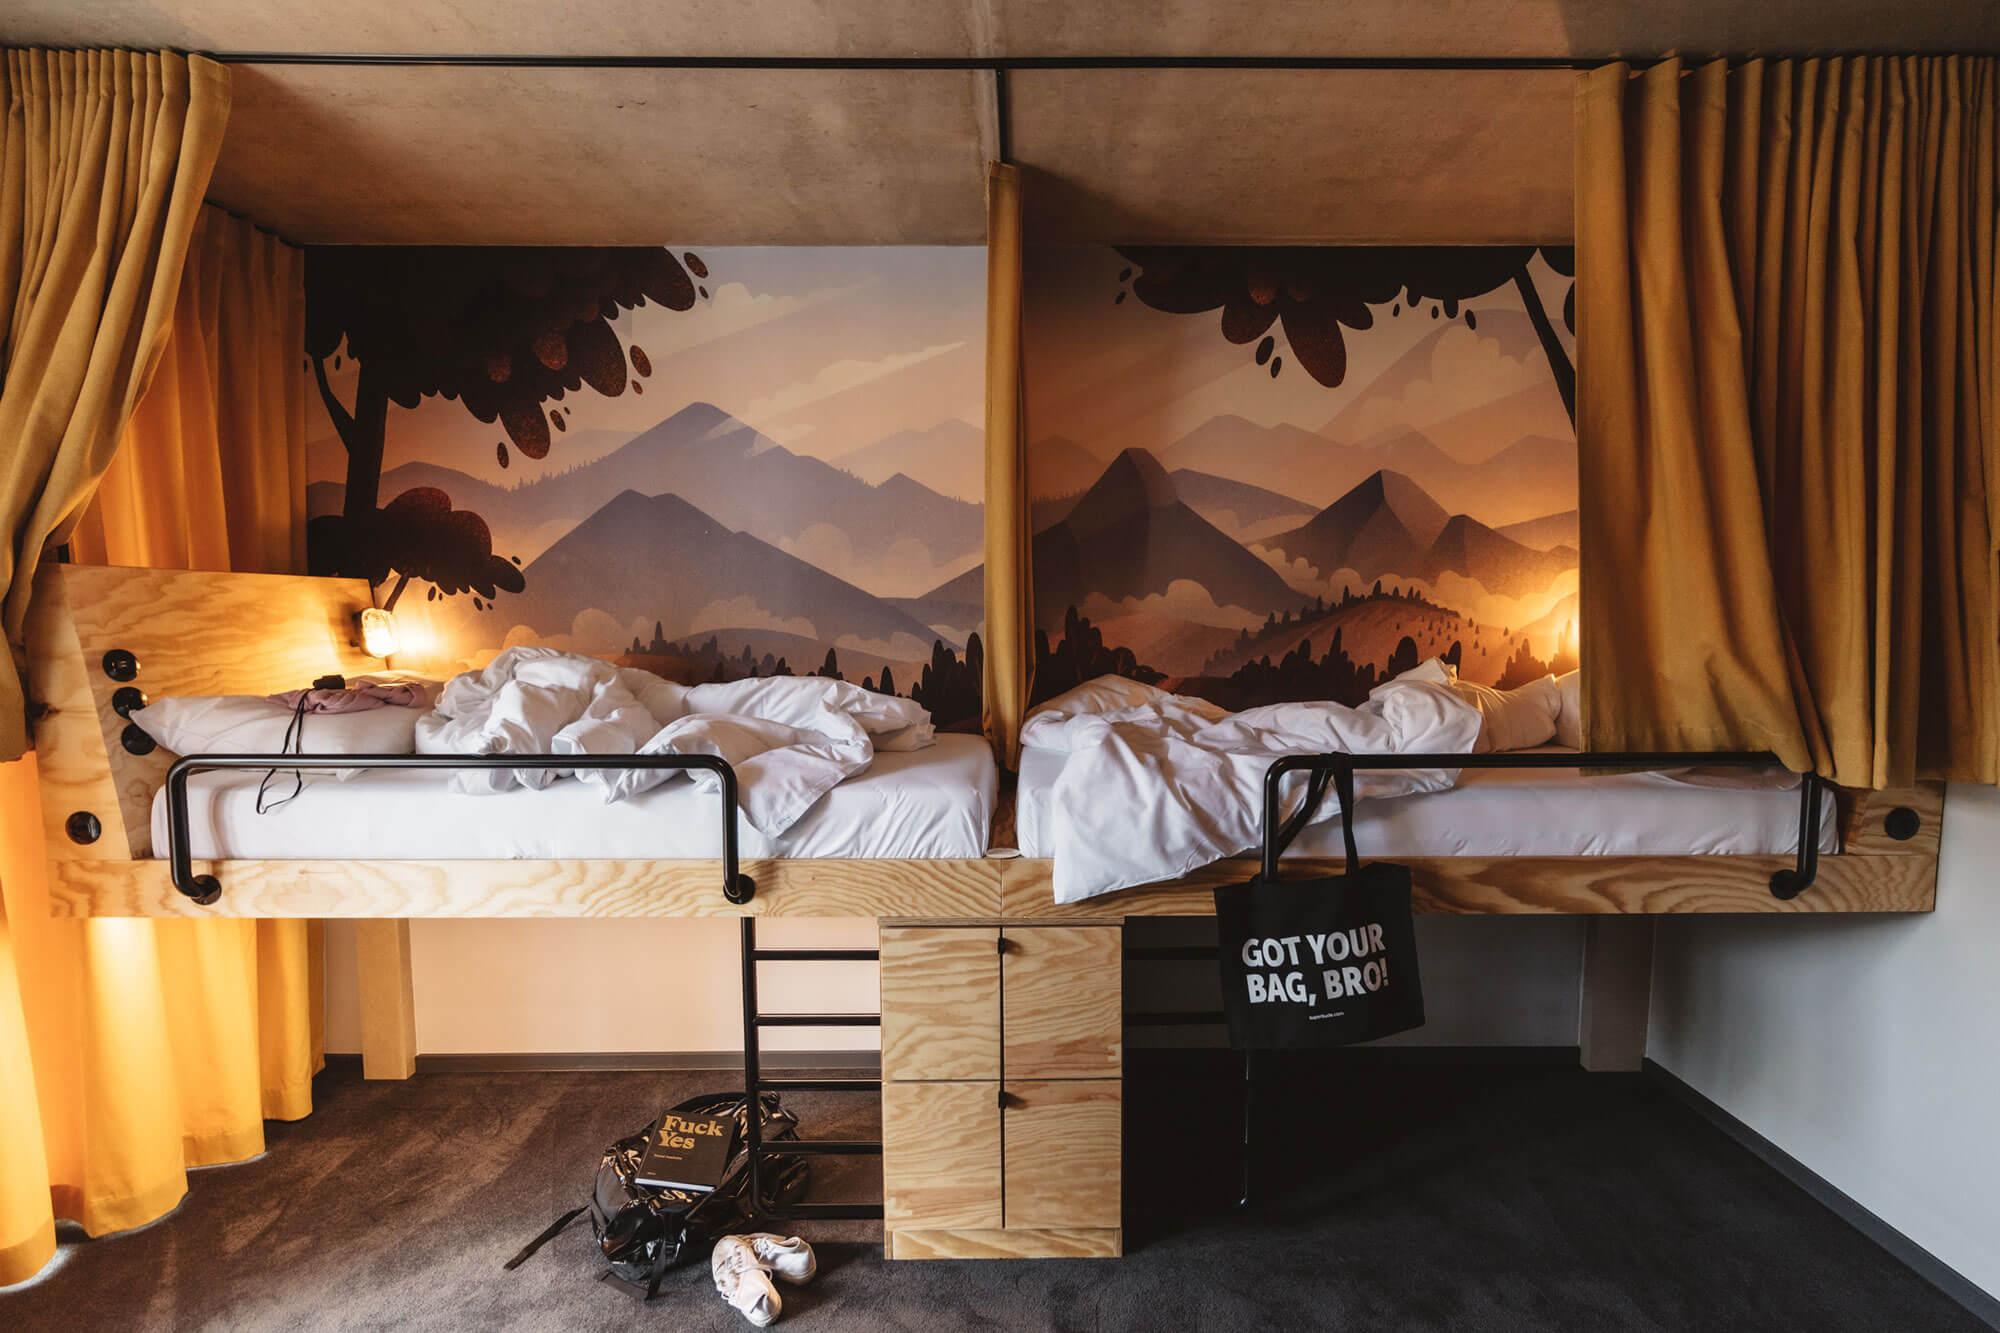 Superbude-Hotel-Hostel-Bachhuber-Hoteleinrichtungen-1